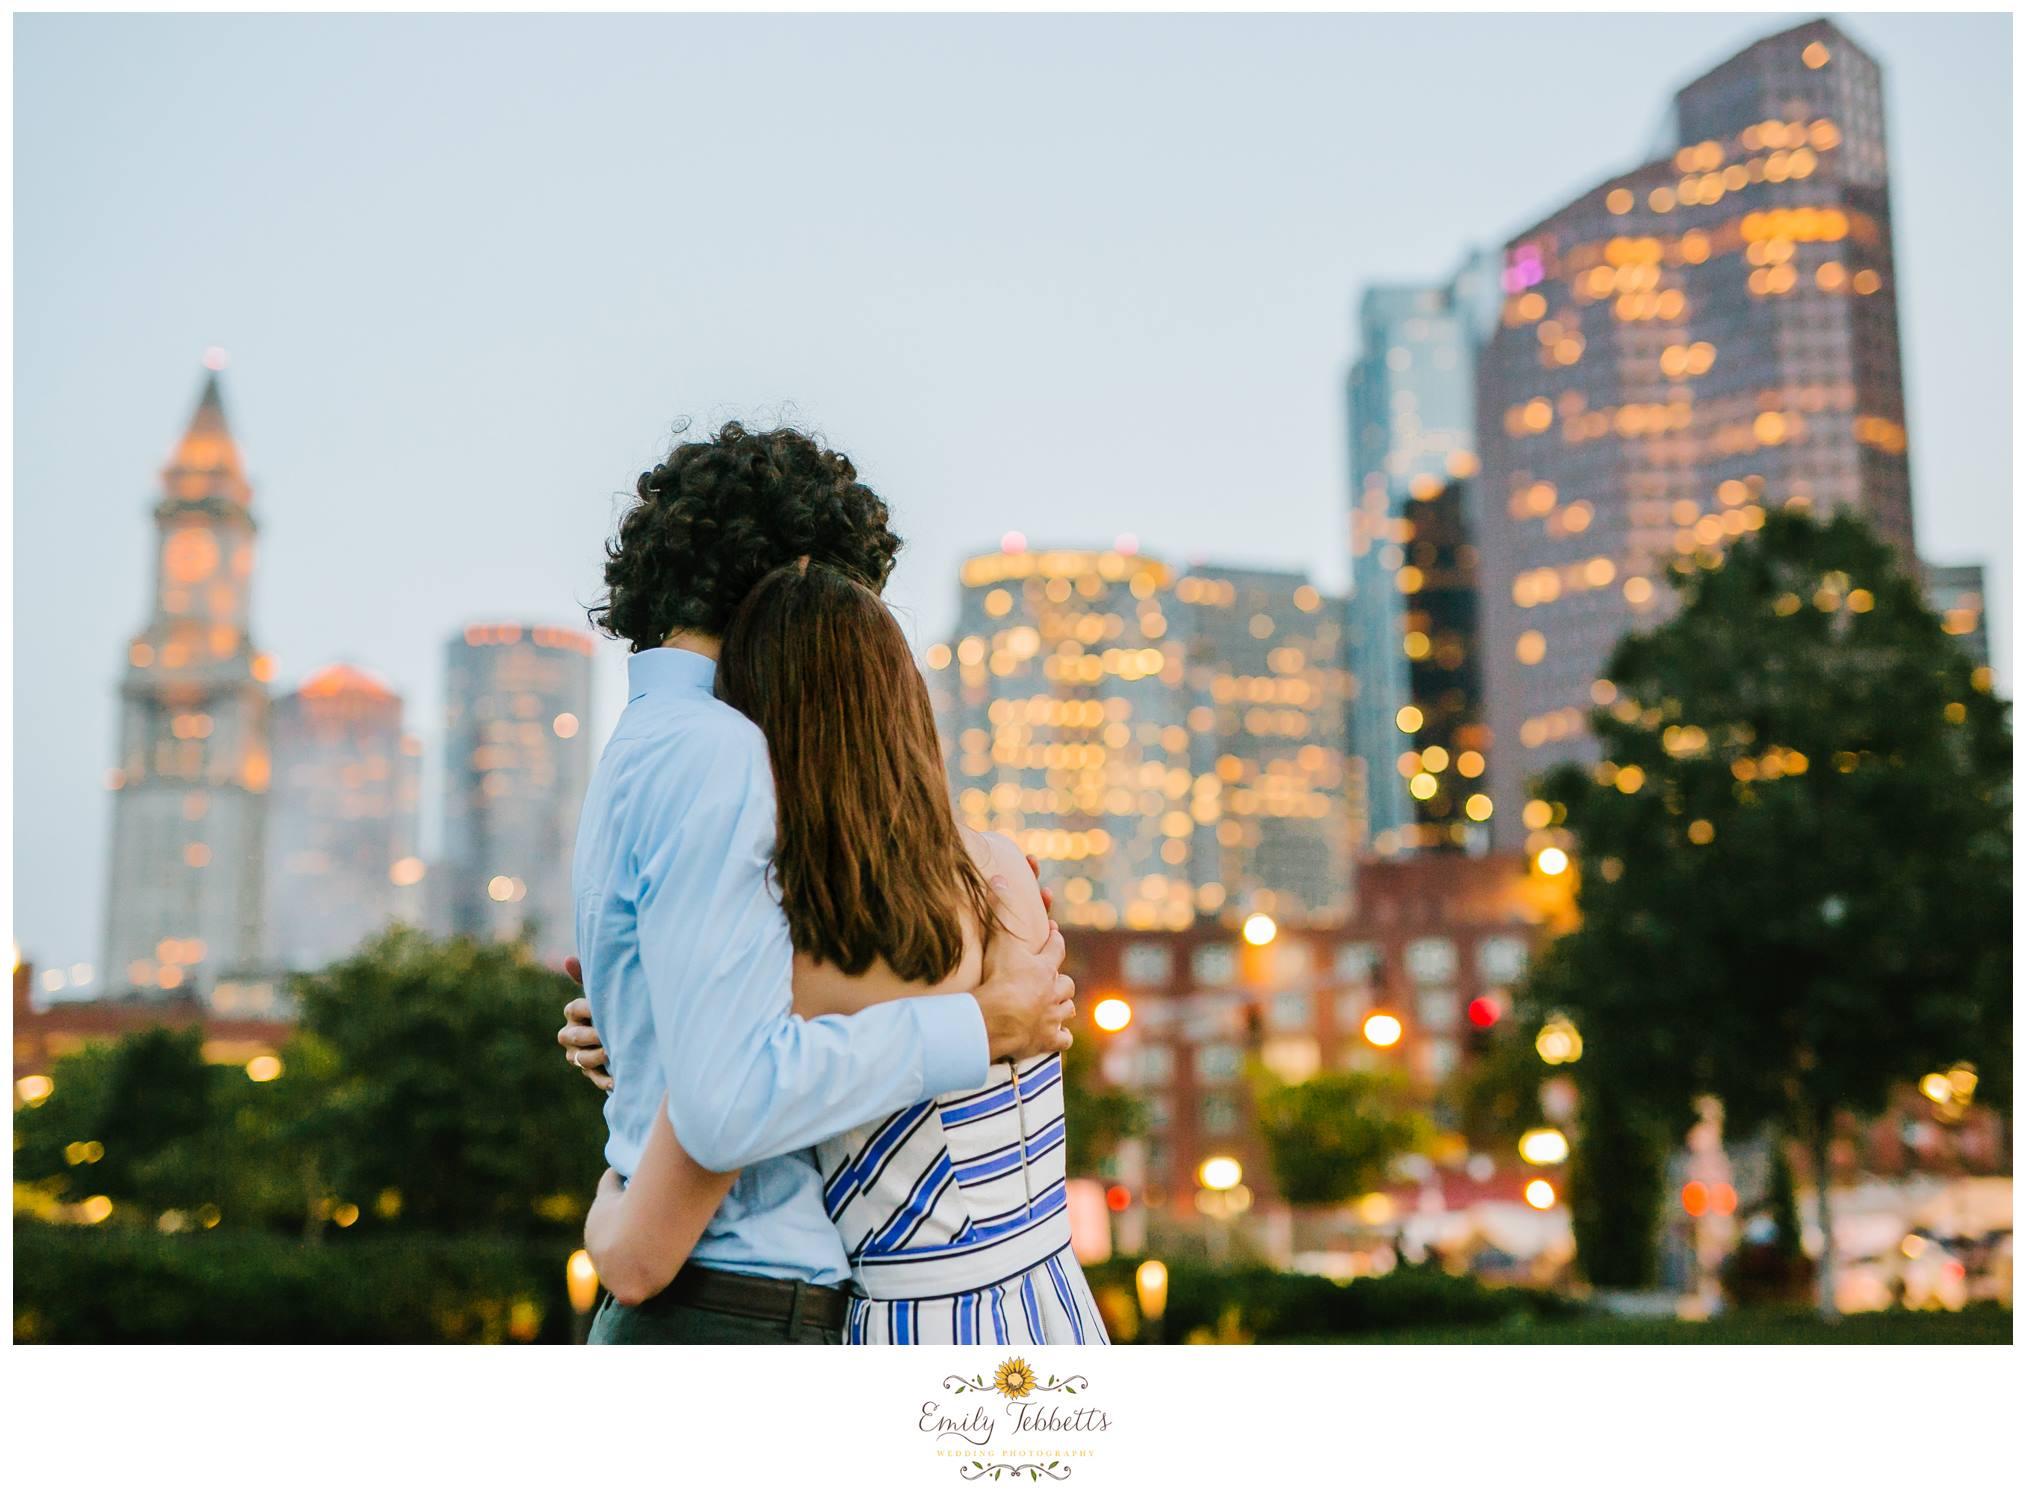 Emily Tebbetts Wedding Photography - North End Engagement Session Sneak Peeks 5.jpg